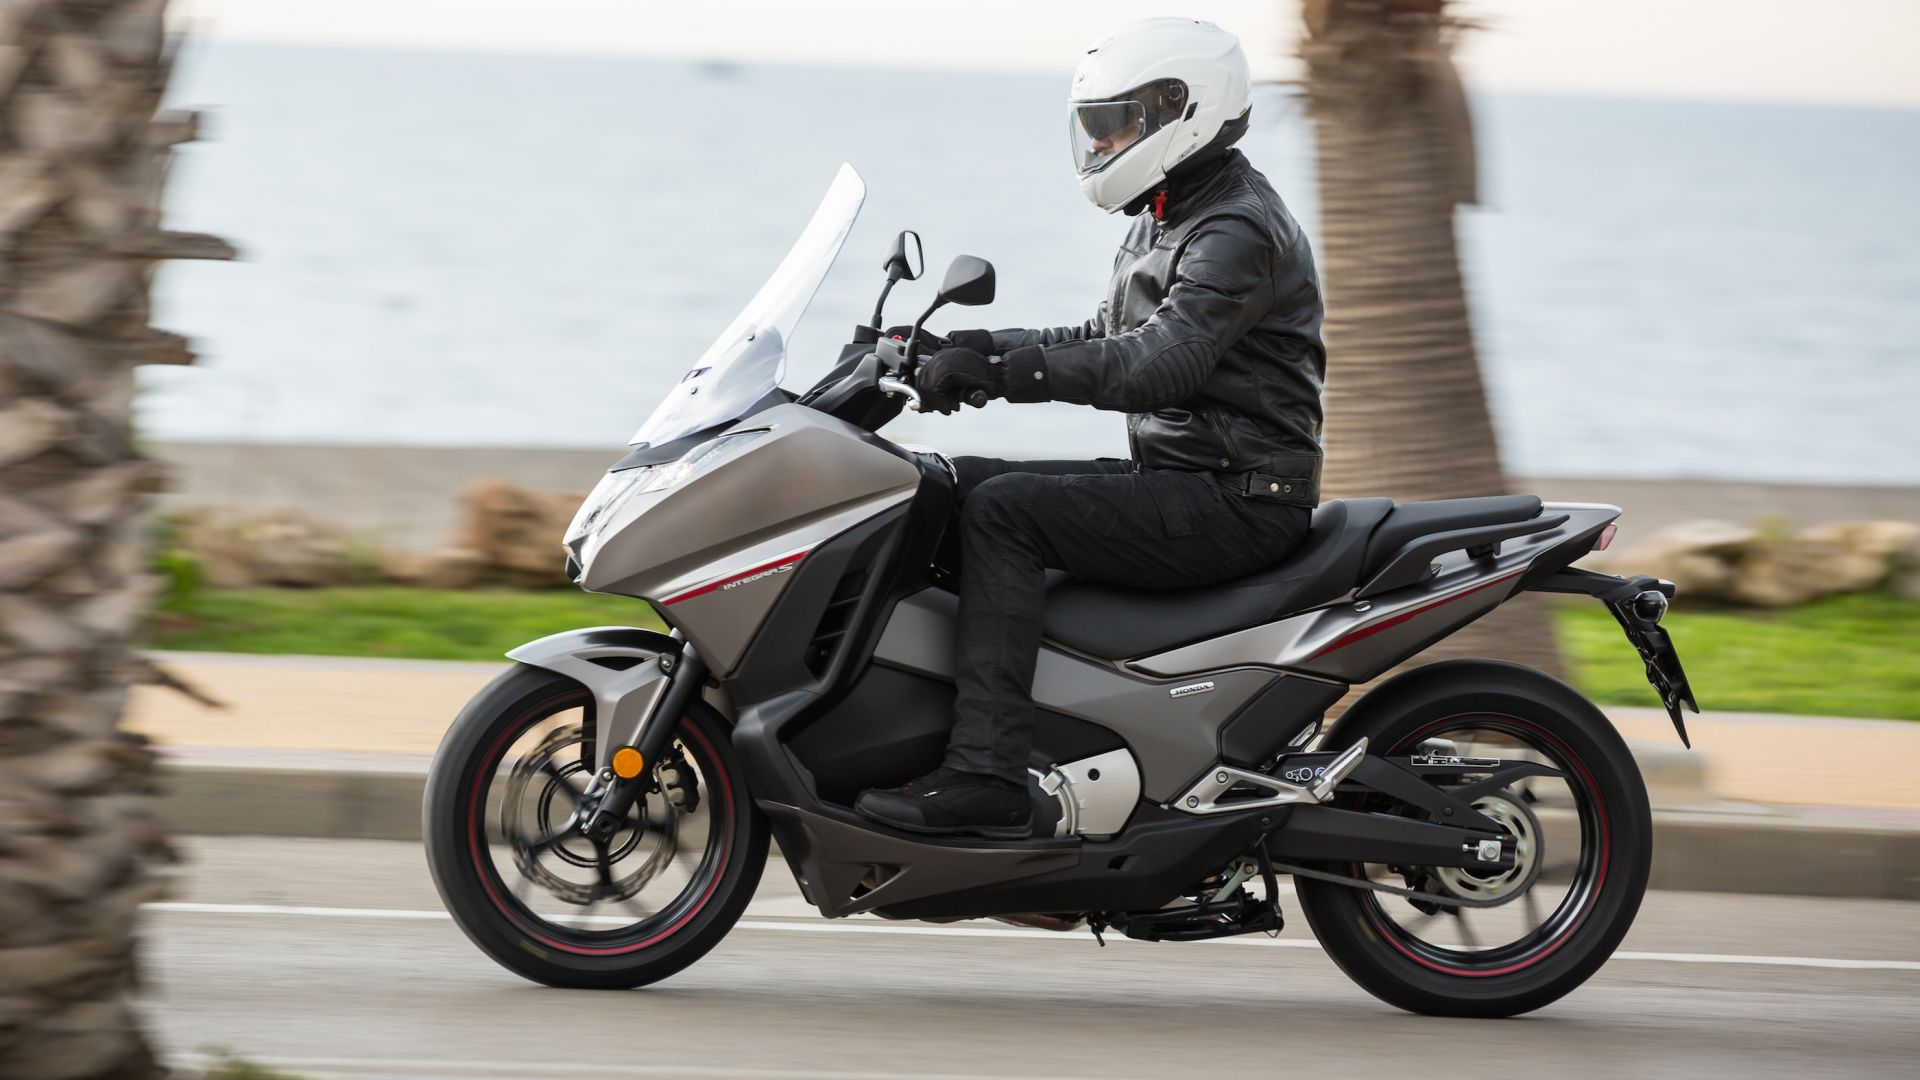 Prova su strada: Honda Integra 750 S 2016 - MotorBox